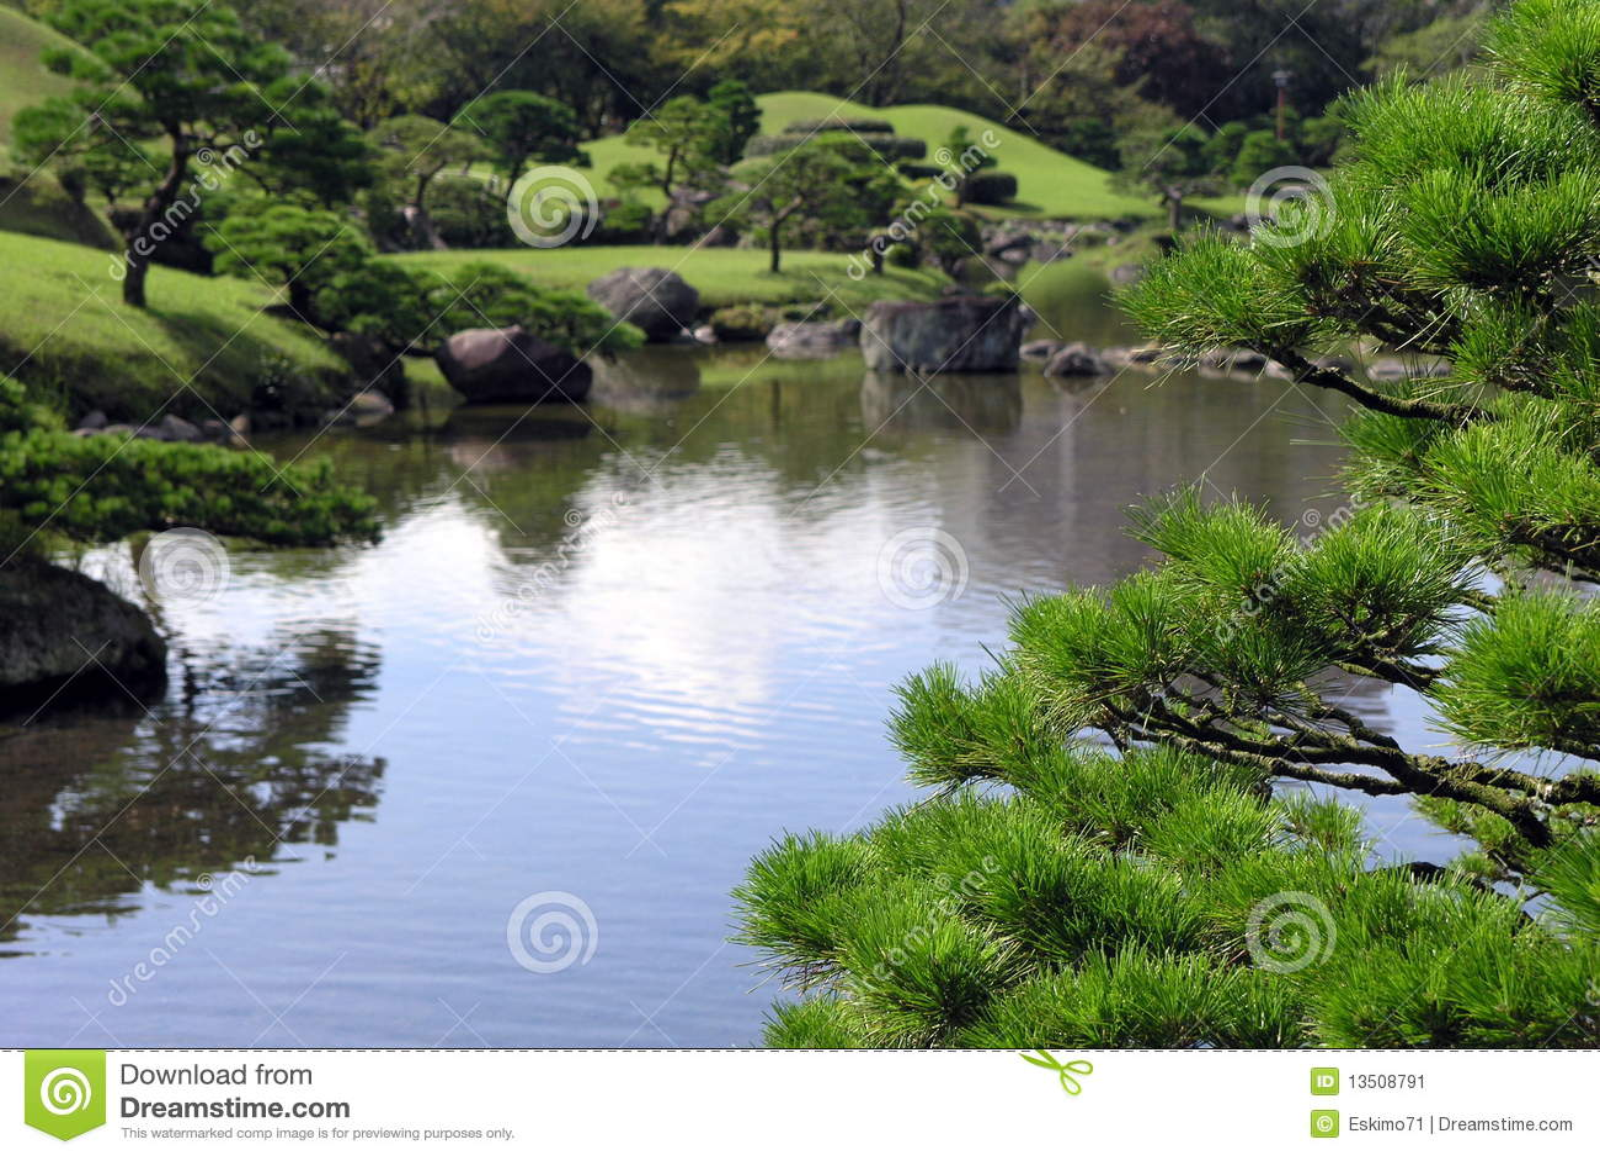 Pond in japanese garden stock image image 13508791 for Japanese pond plants